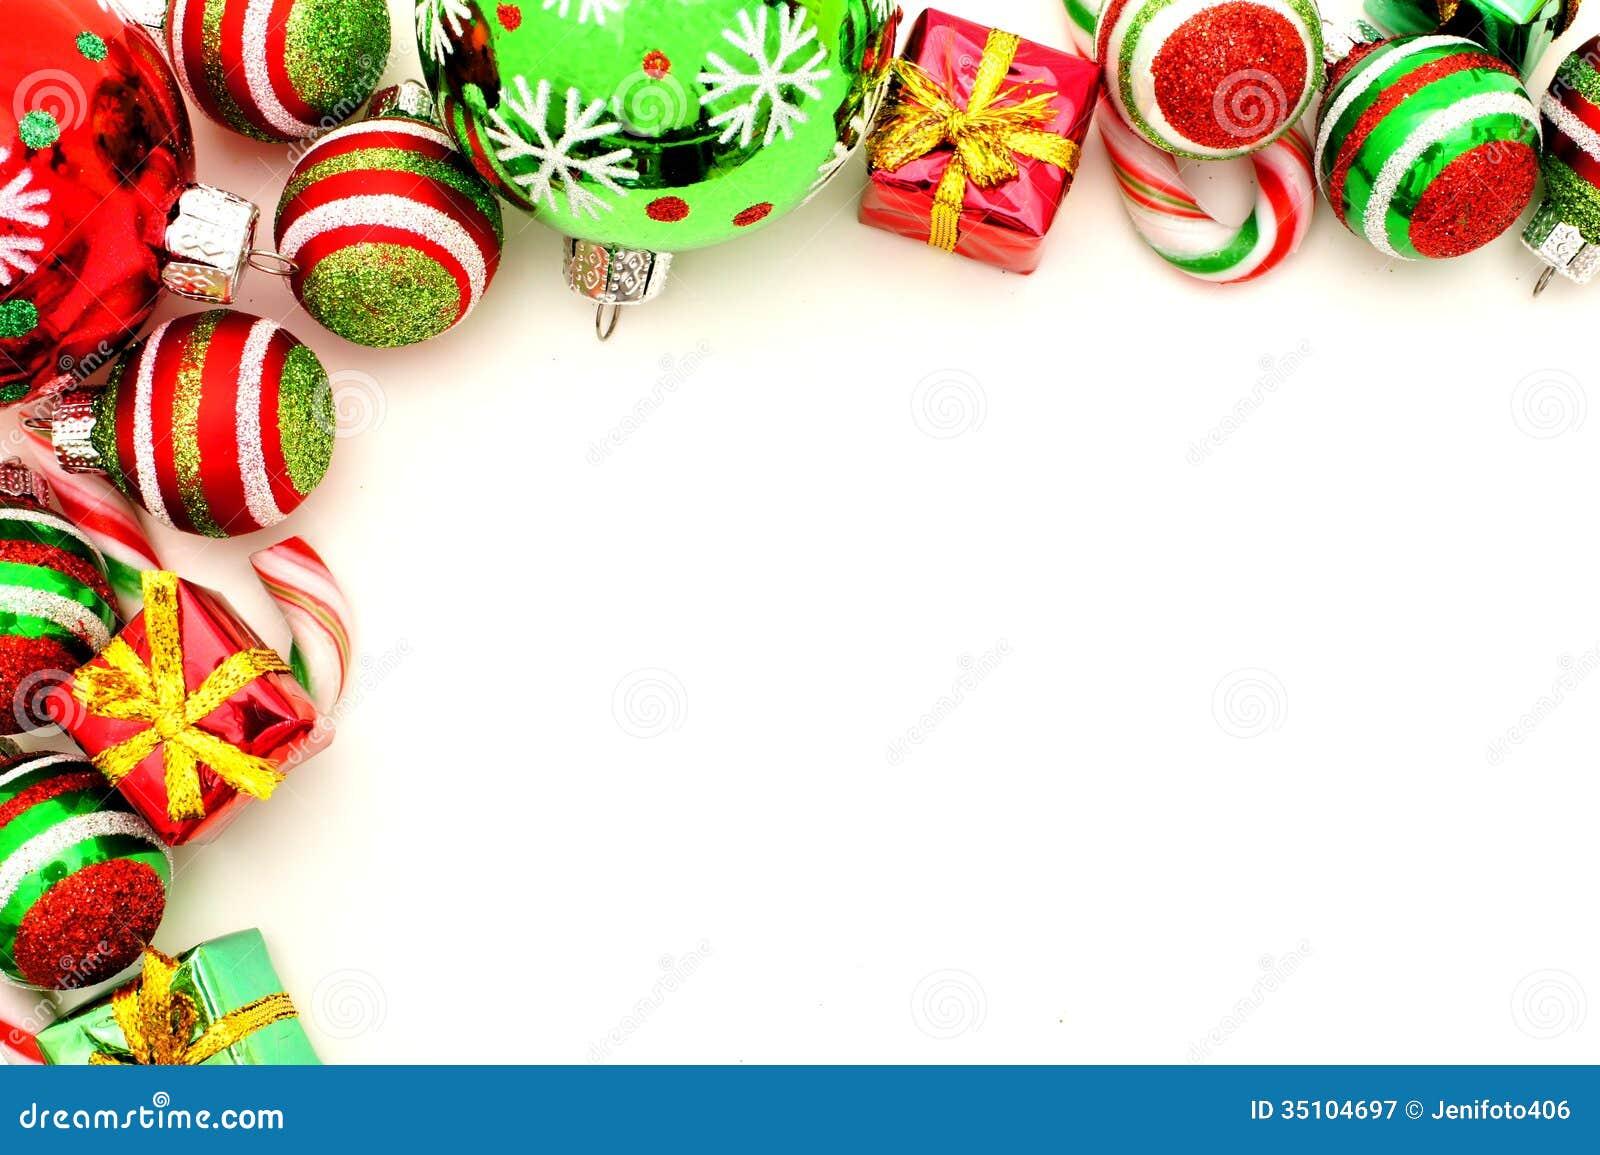 Christmas Toys Border : Christmas border stock image of arrangement corner